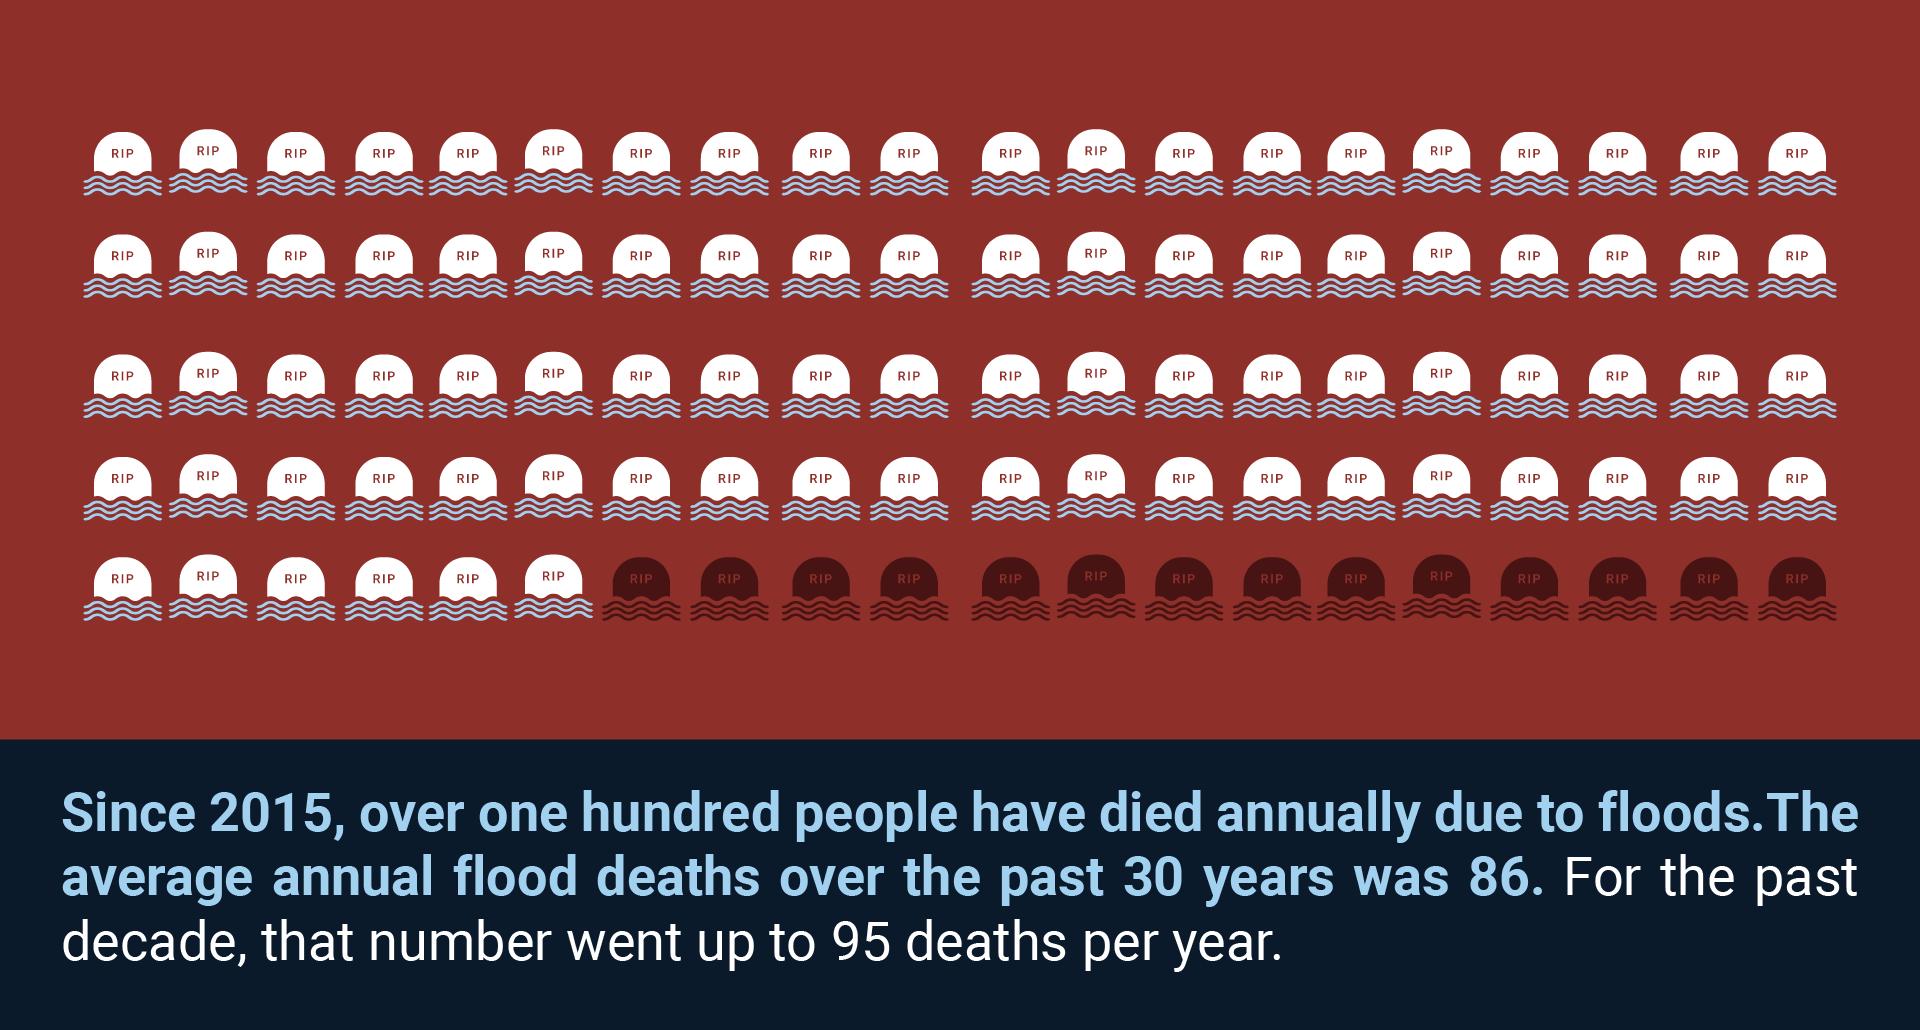 flood deaths